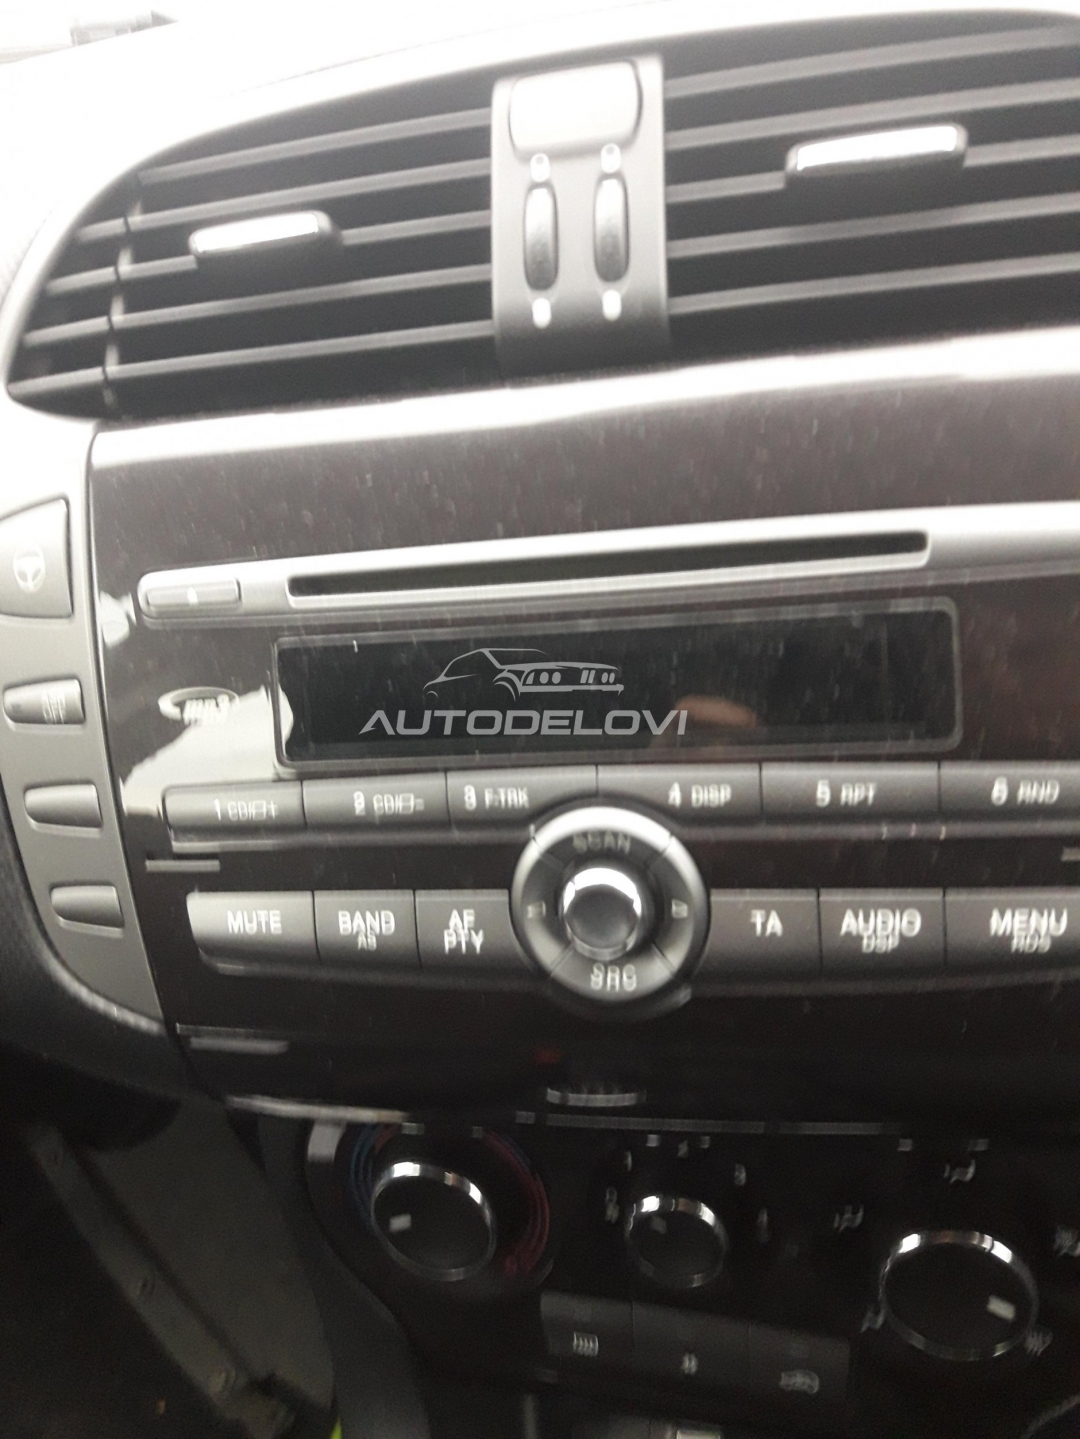 Fiat Bravo dvojks cd mp3 fabricki cd